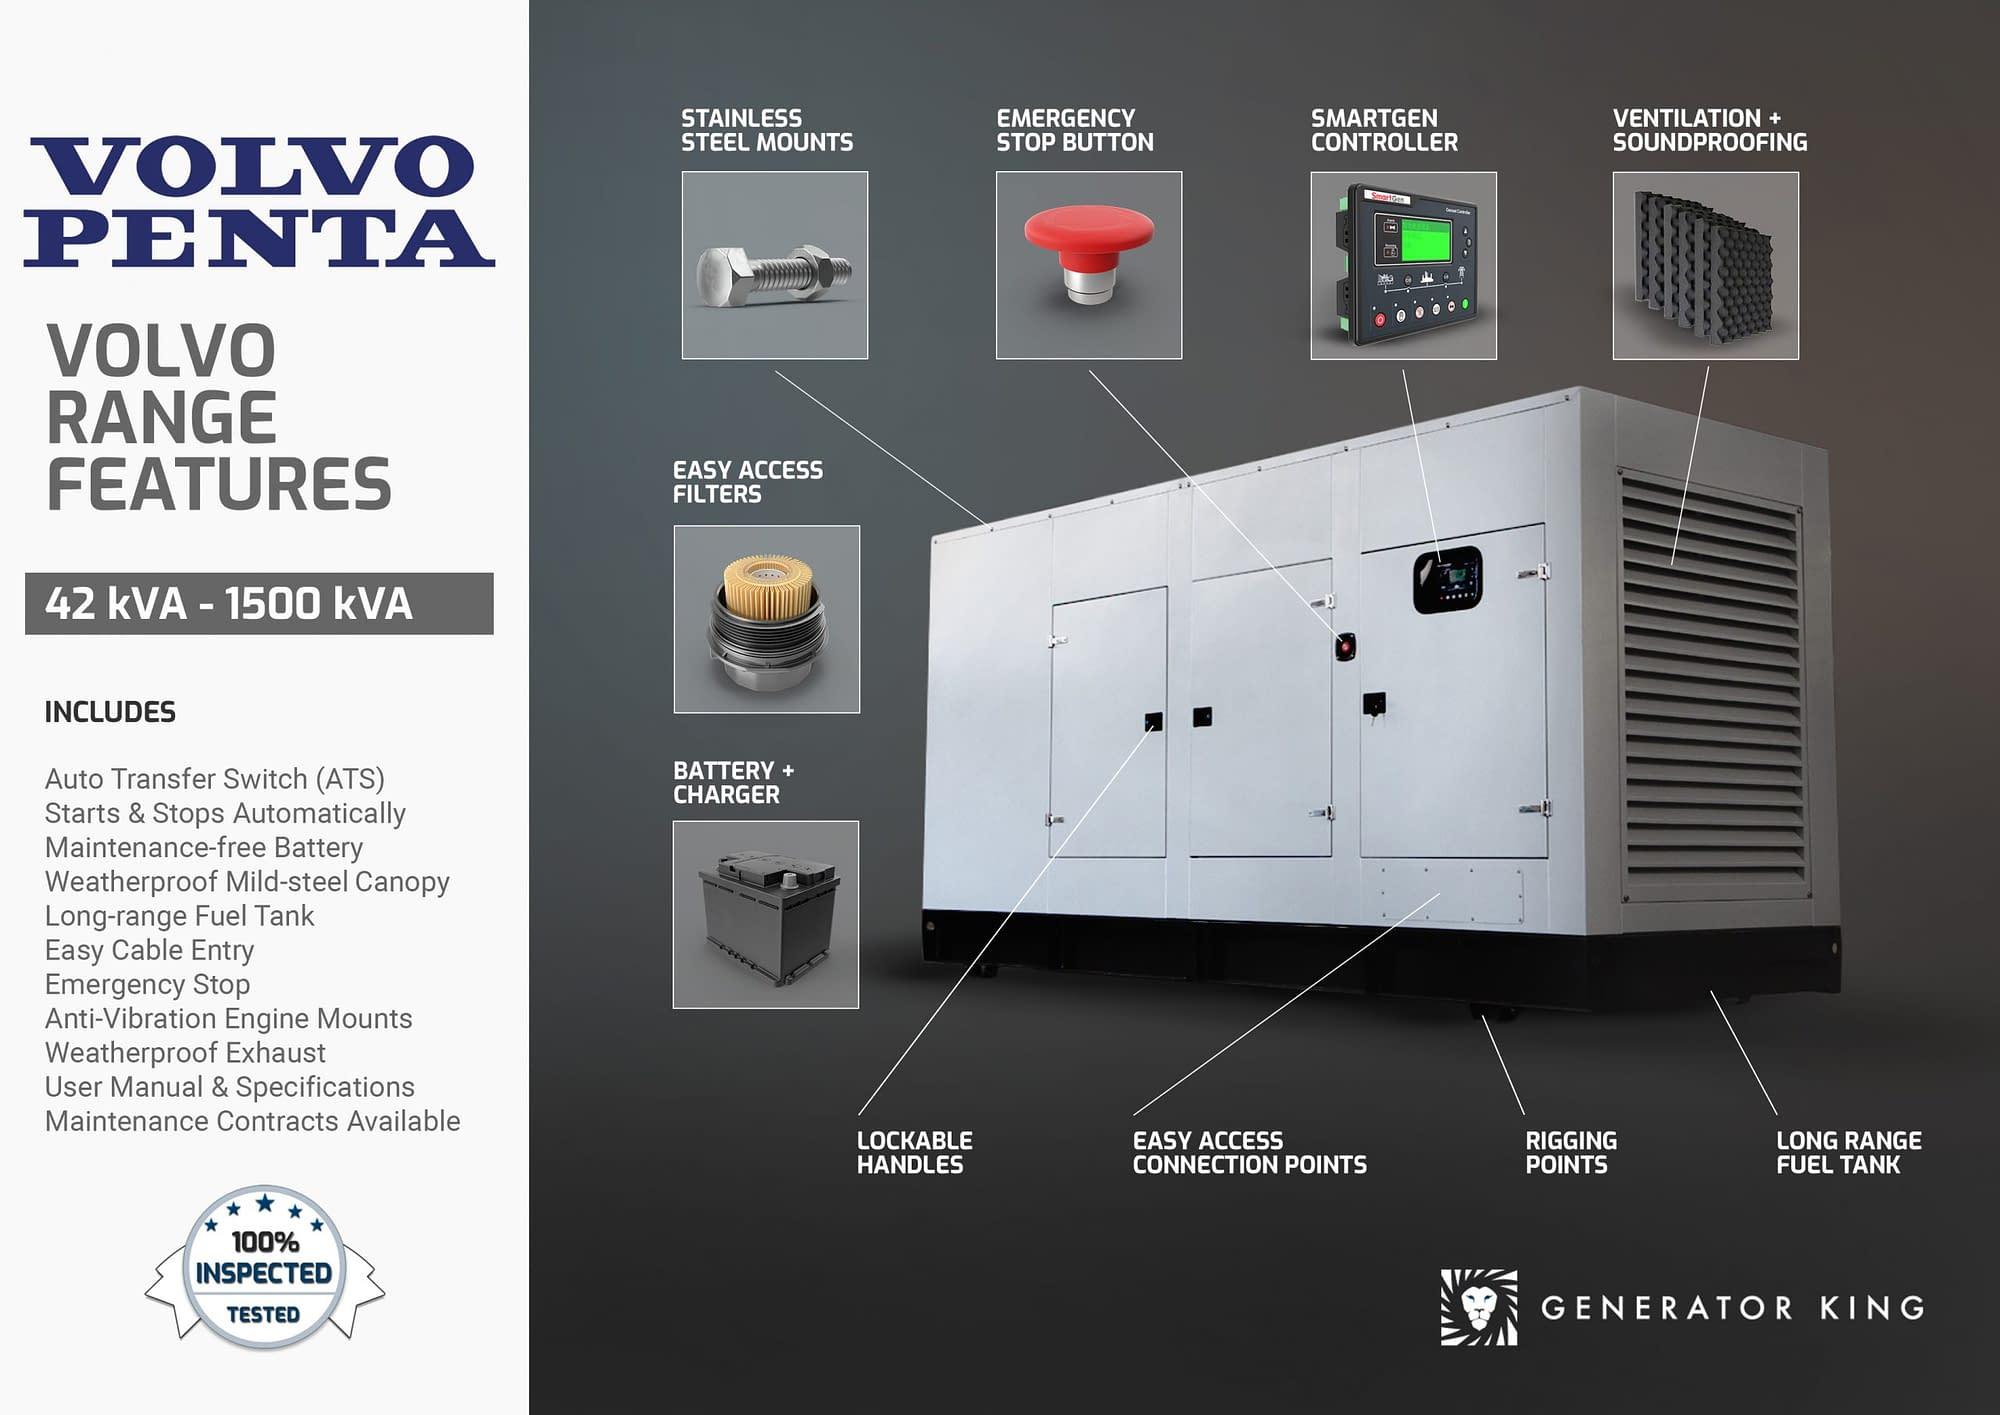 Volvo Diesel Generator for Sale | Volvo Penta Generators Features | Generator King